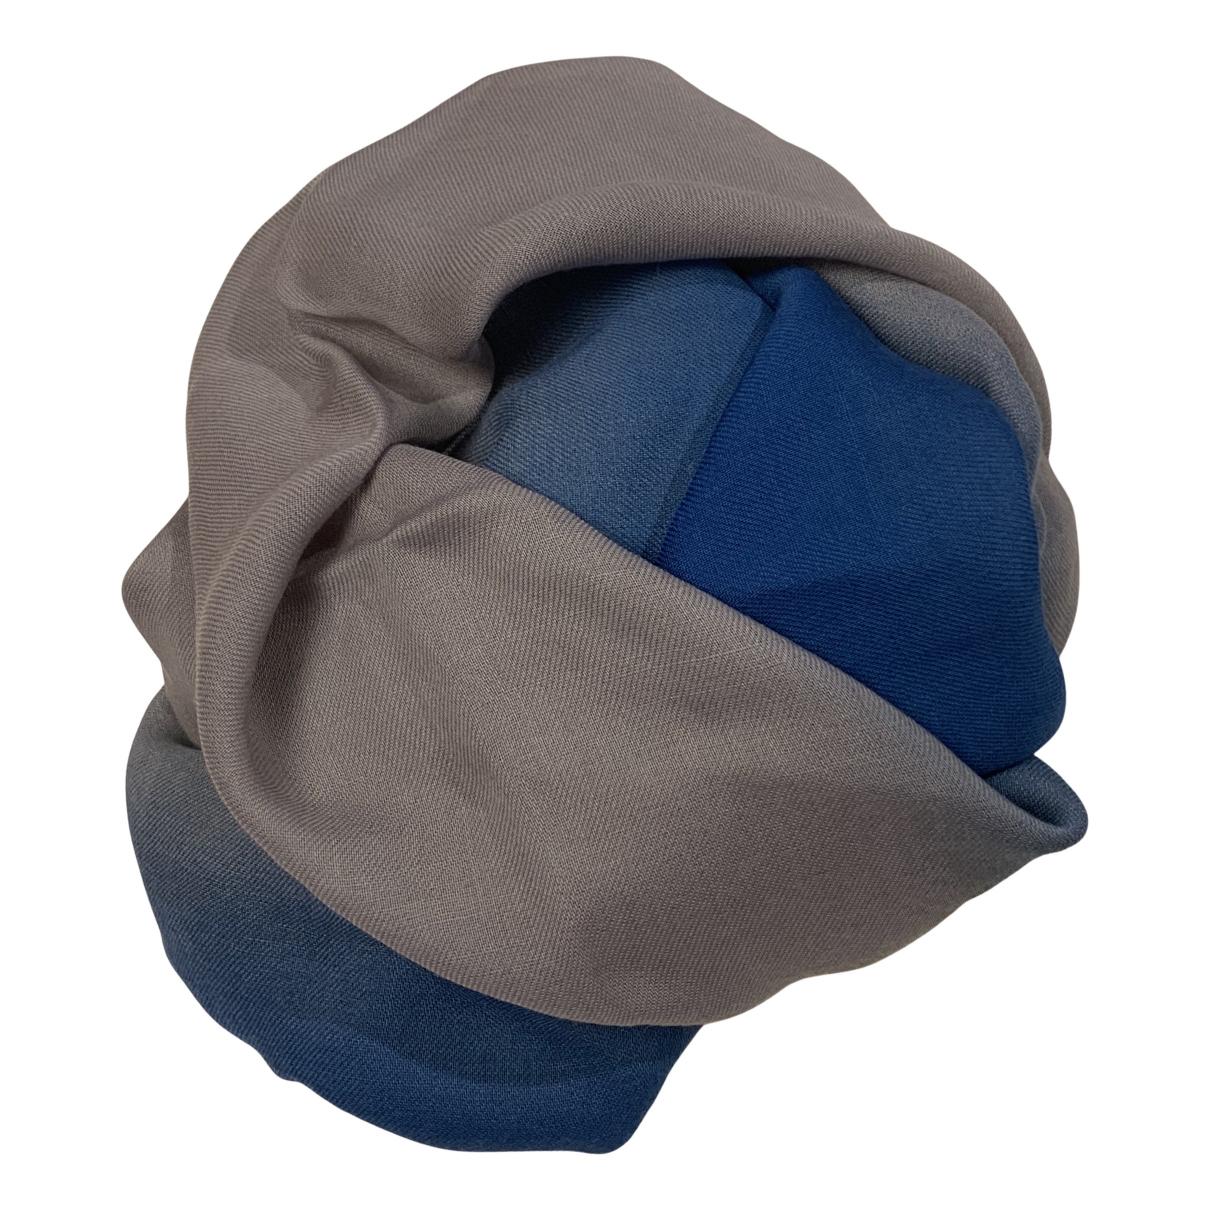 Bottega Veneta N Blue Wool scarf for Women N